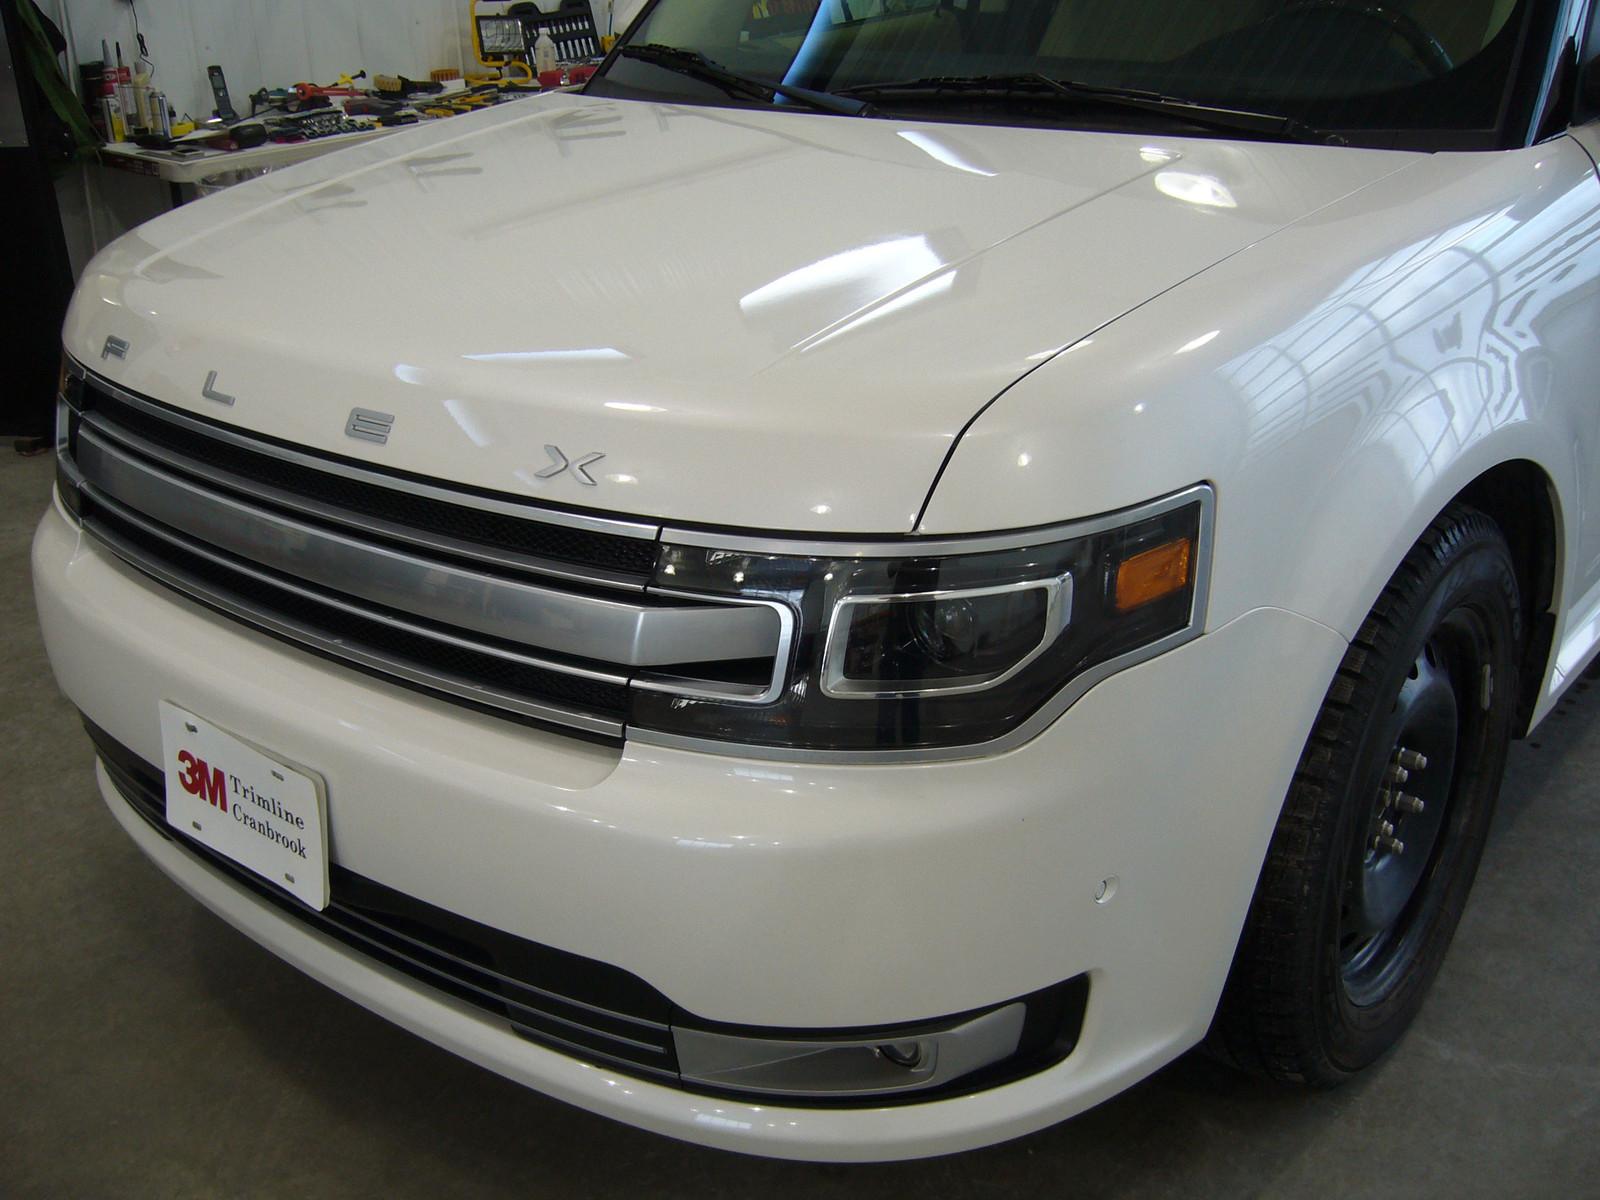 3m window tint 2019 2020 new car reviews 3m window tint >> 3m paint protection film 3m trimline cranbrook paint